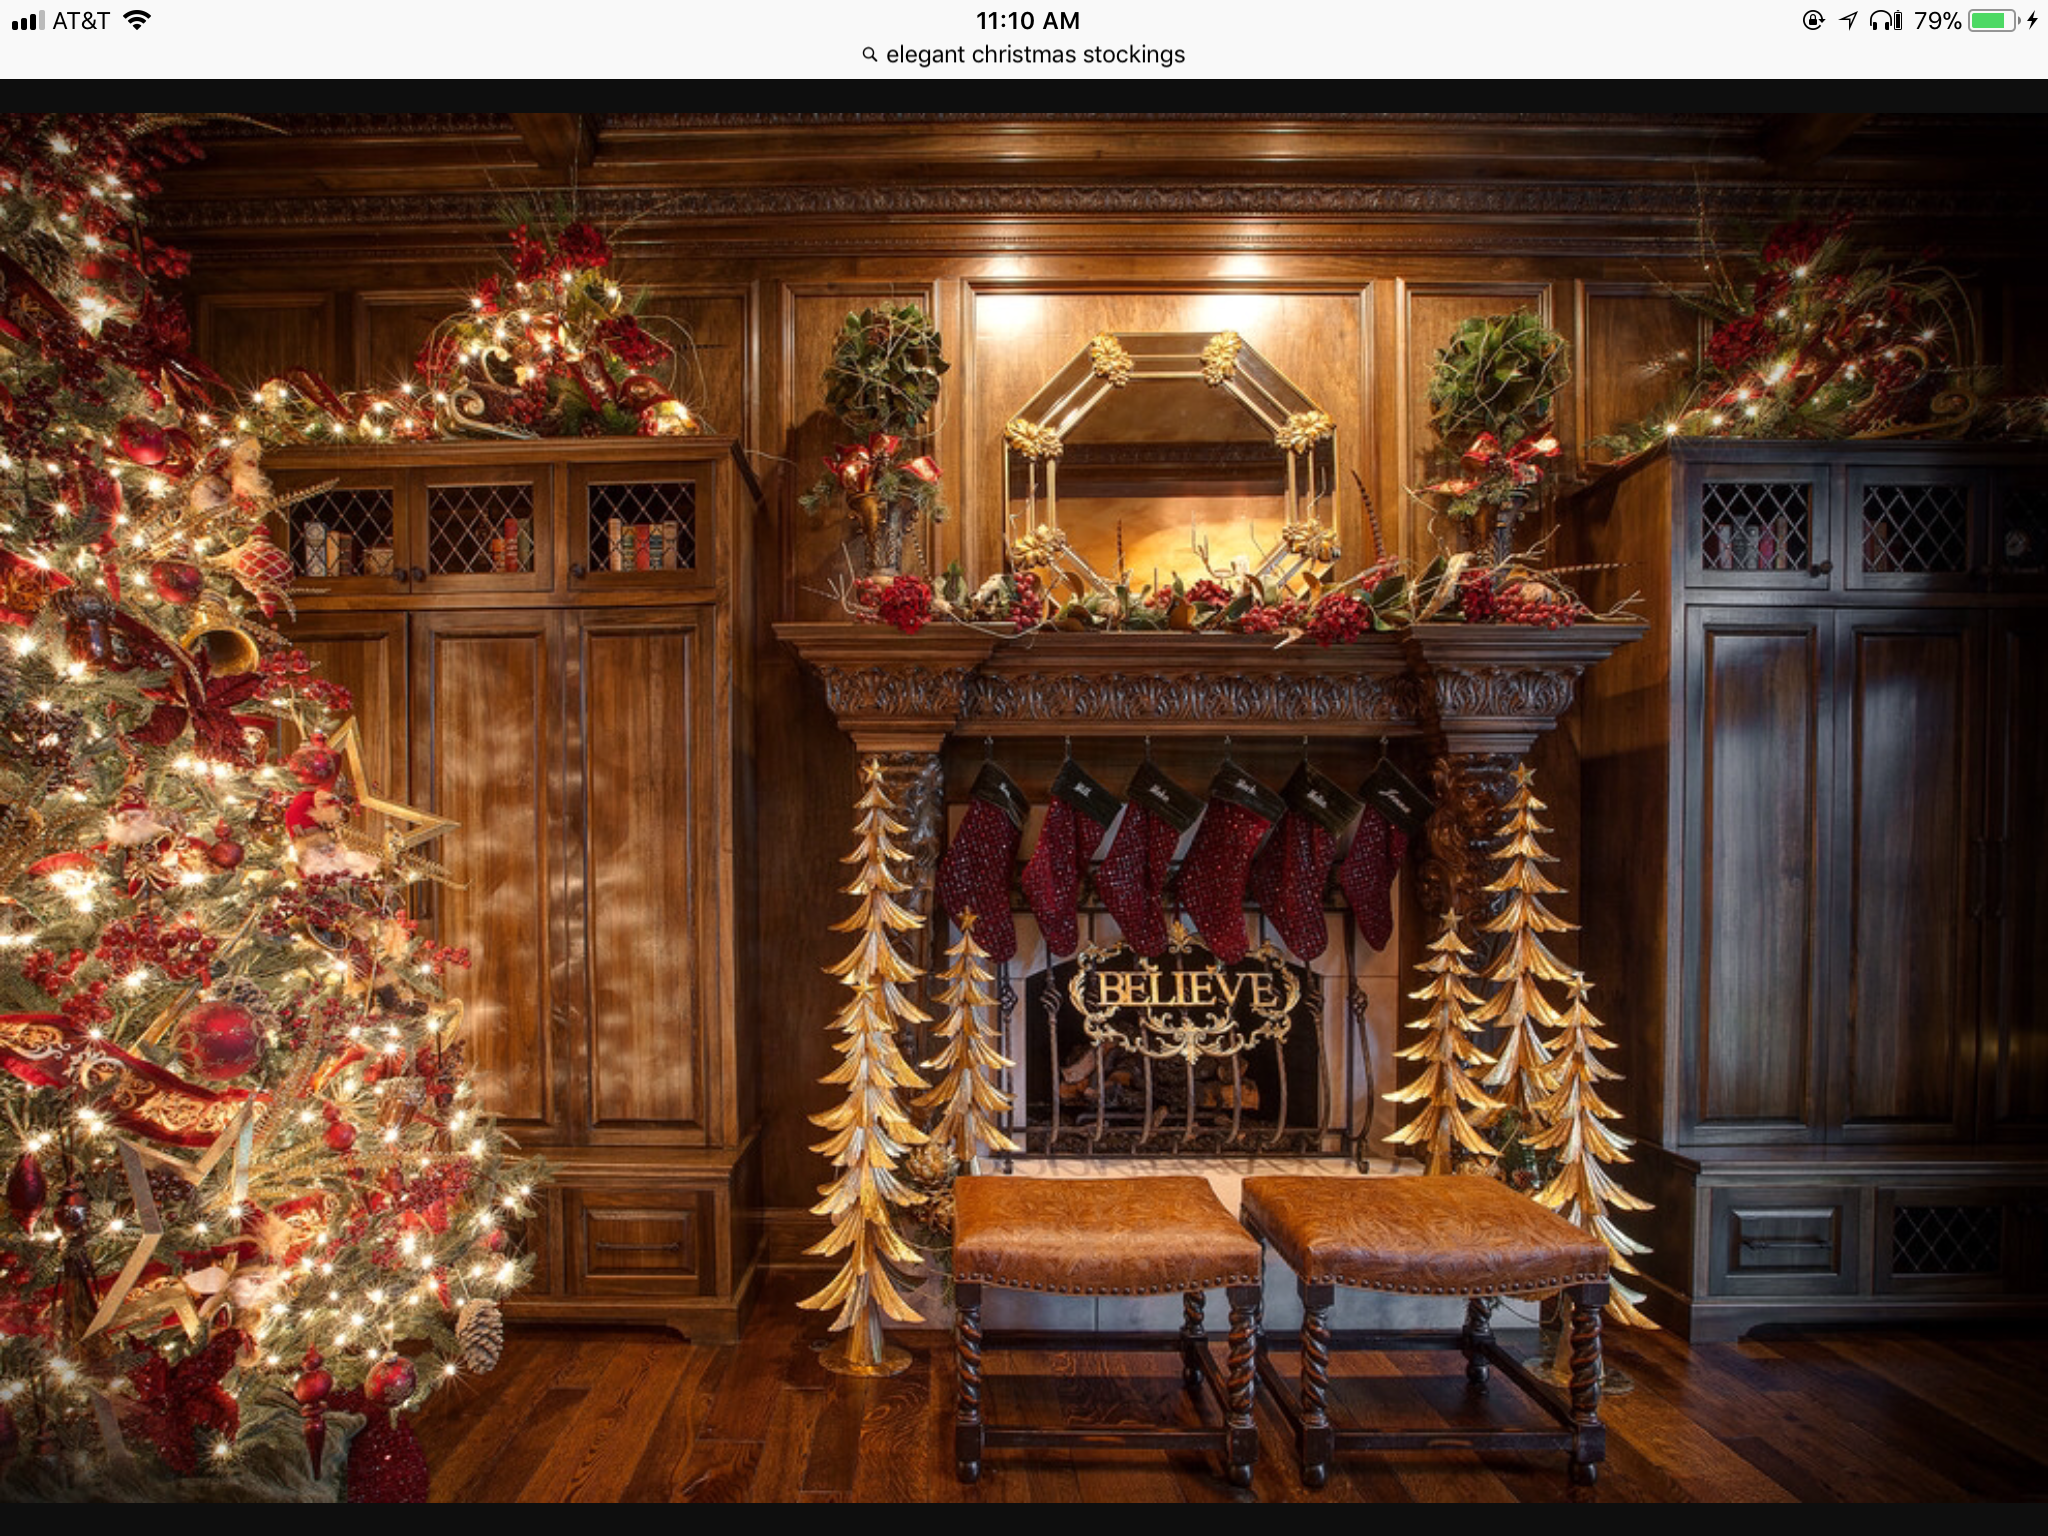 Pin by Sandele1 on Christmas Mantels - no pin limits ...